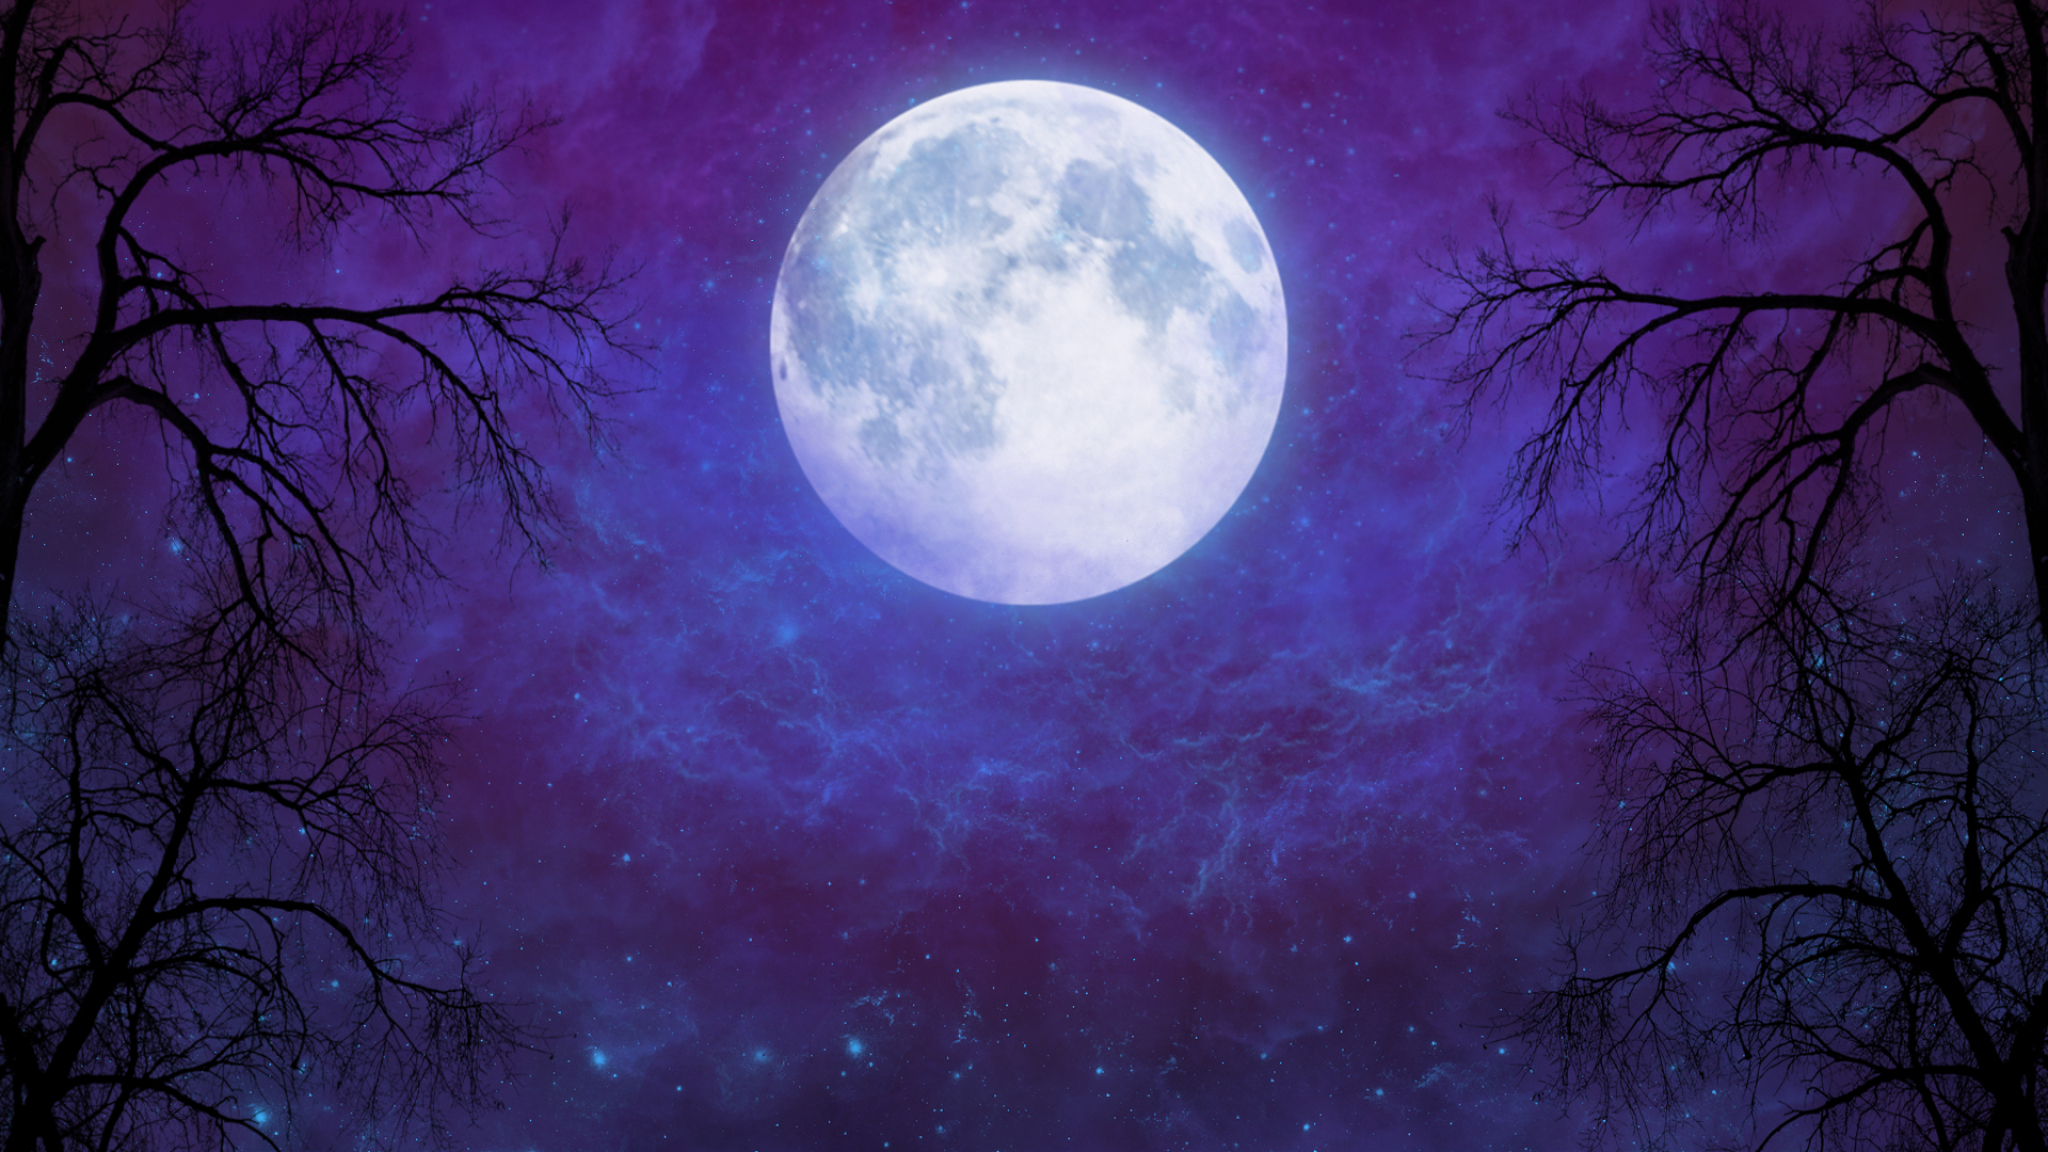 Artistic Full Moon In Starry Night Sky Full Hd Wallpaper